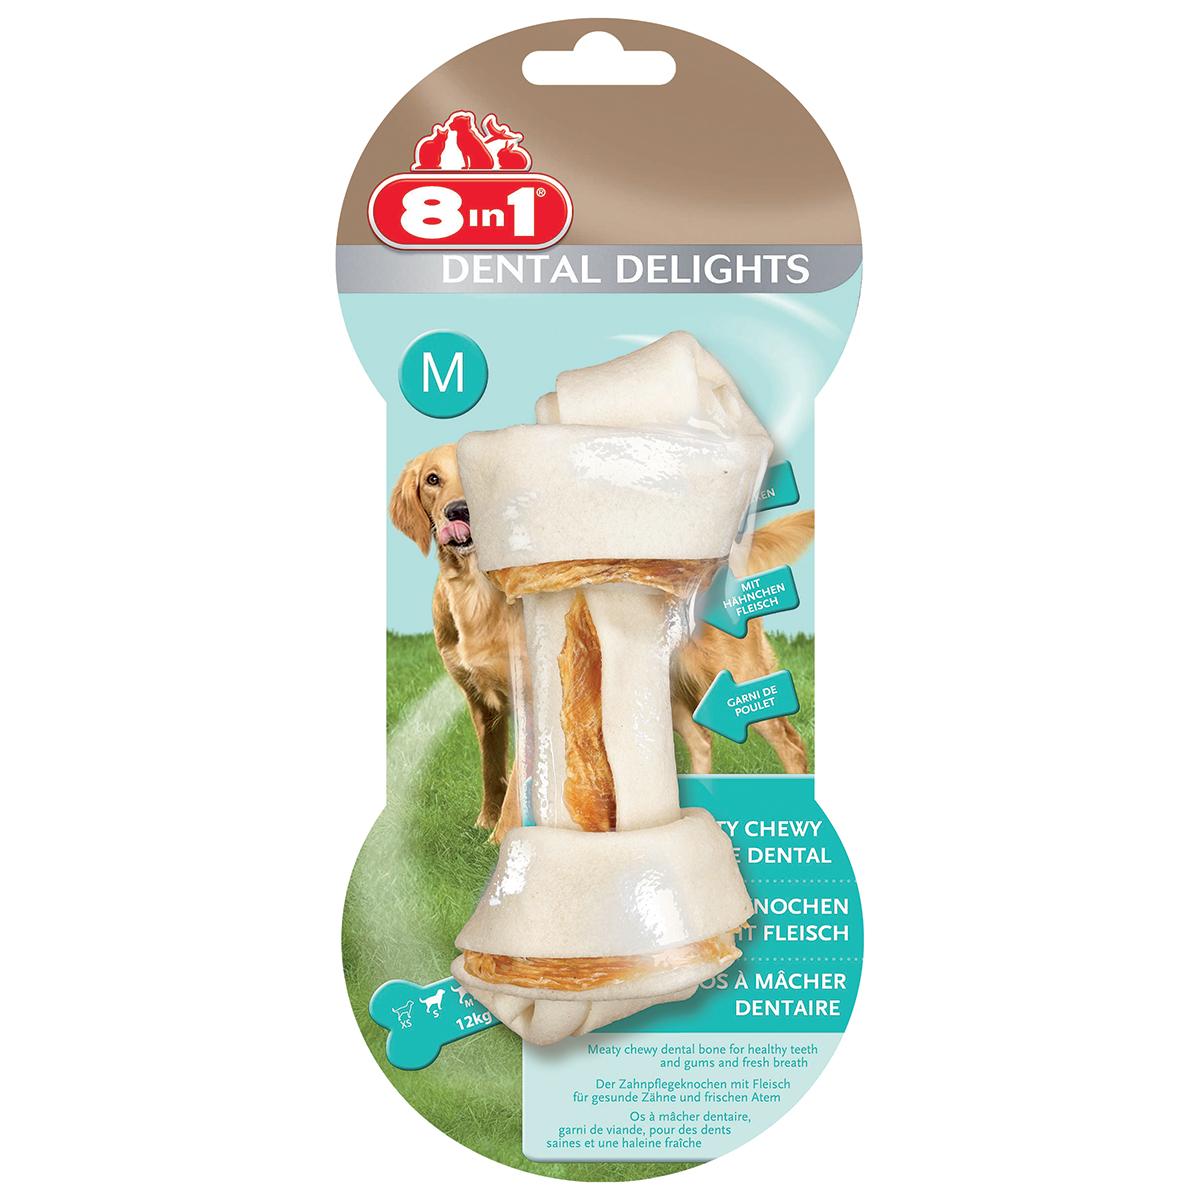 8 in 1 Oase Dental Delights M imagine